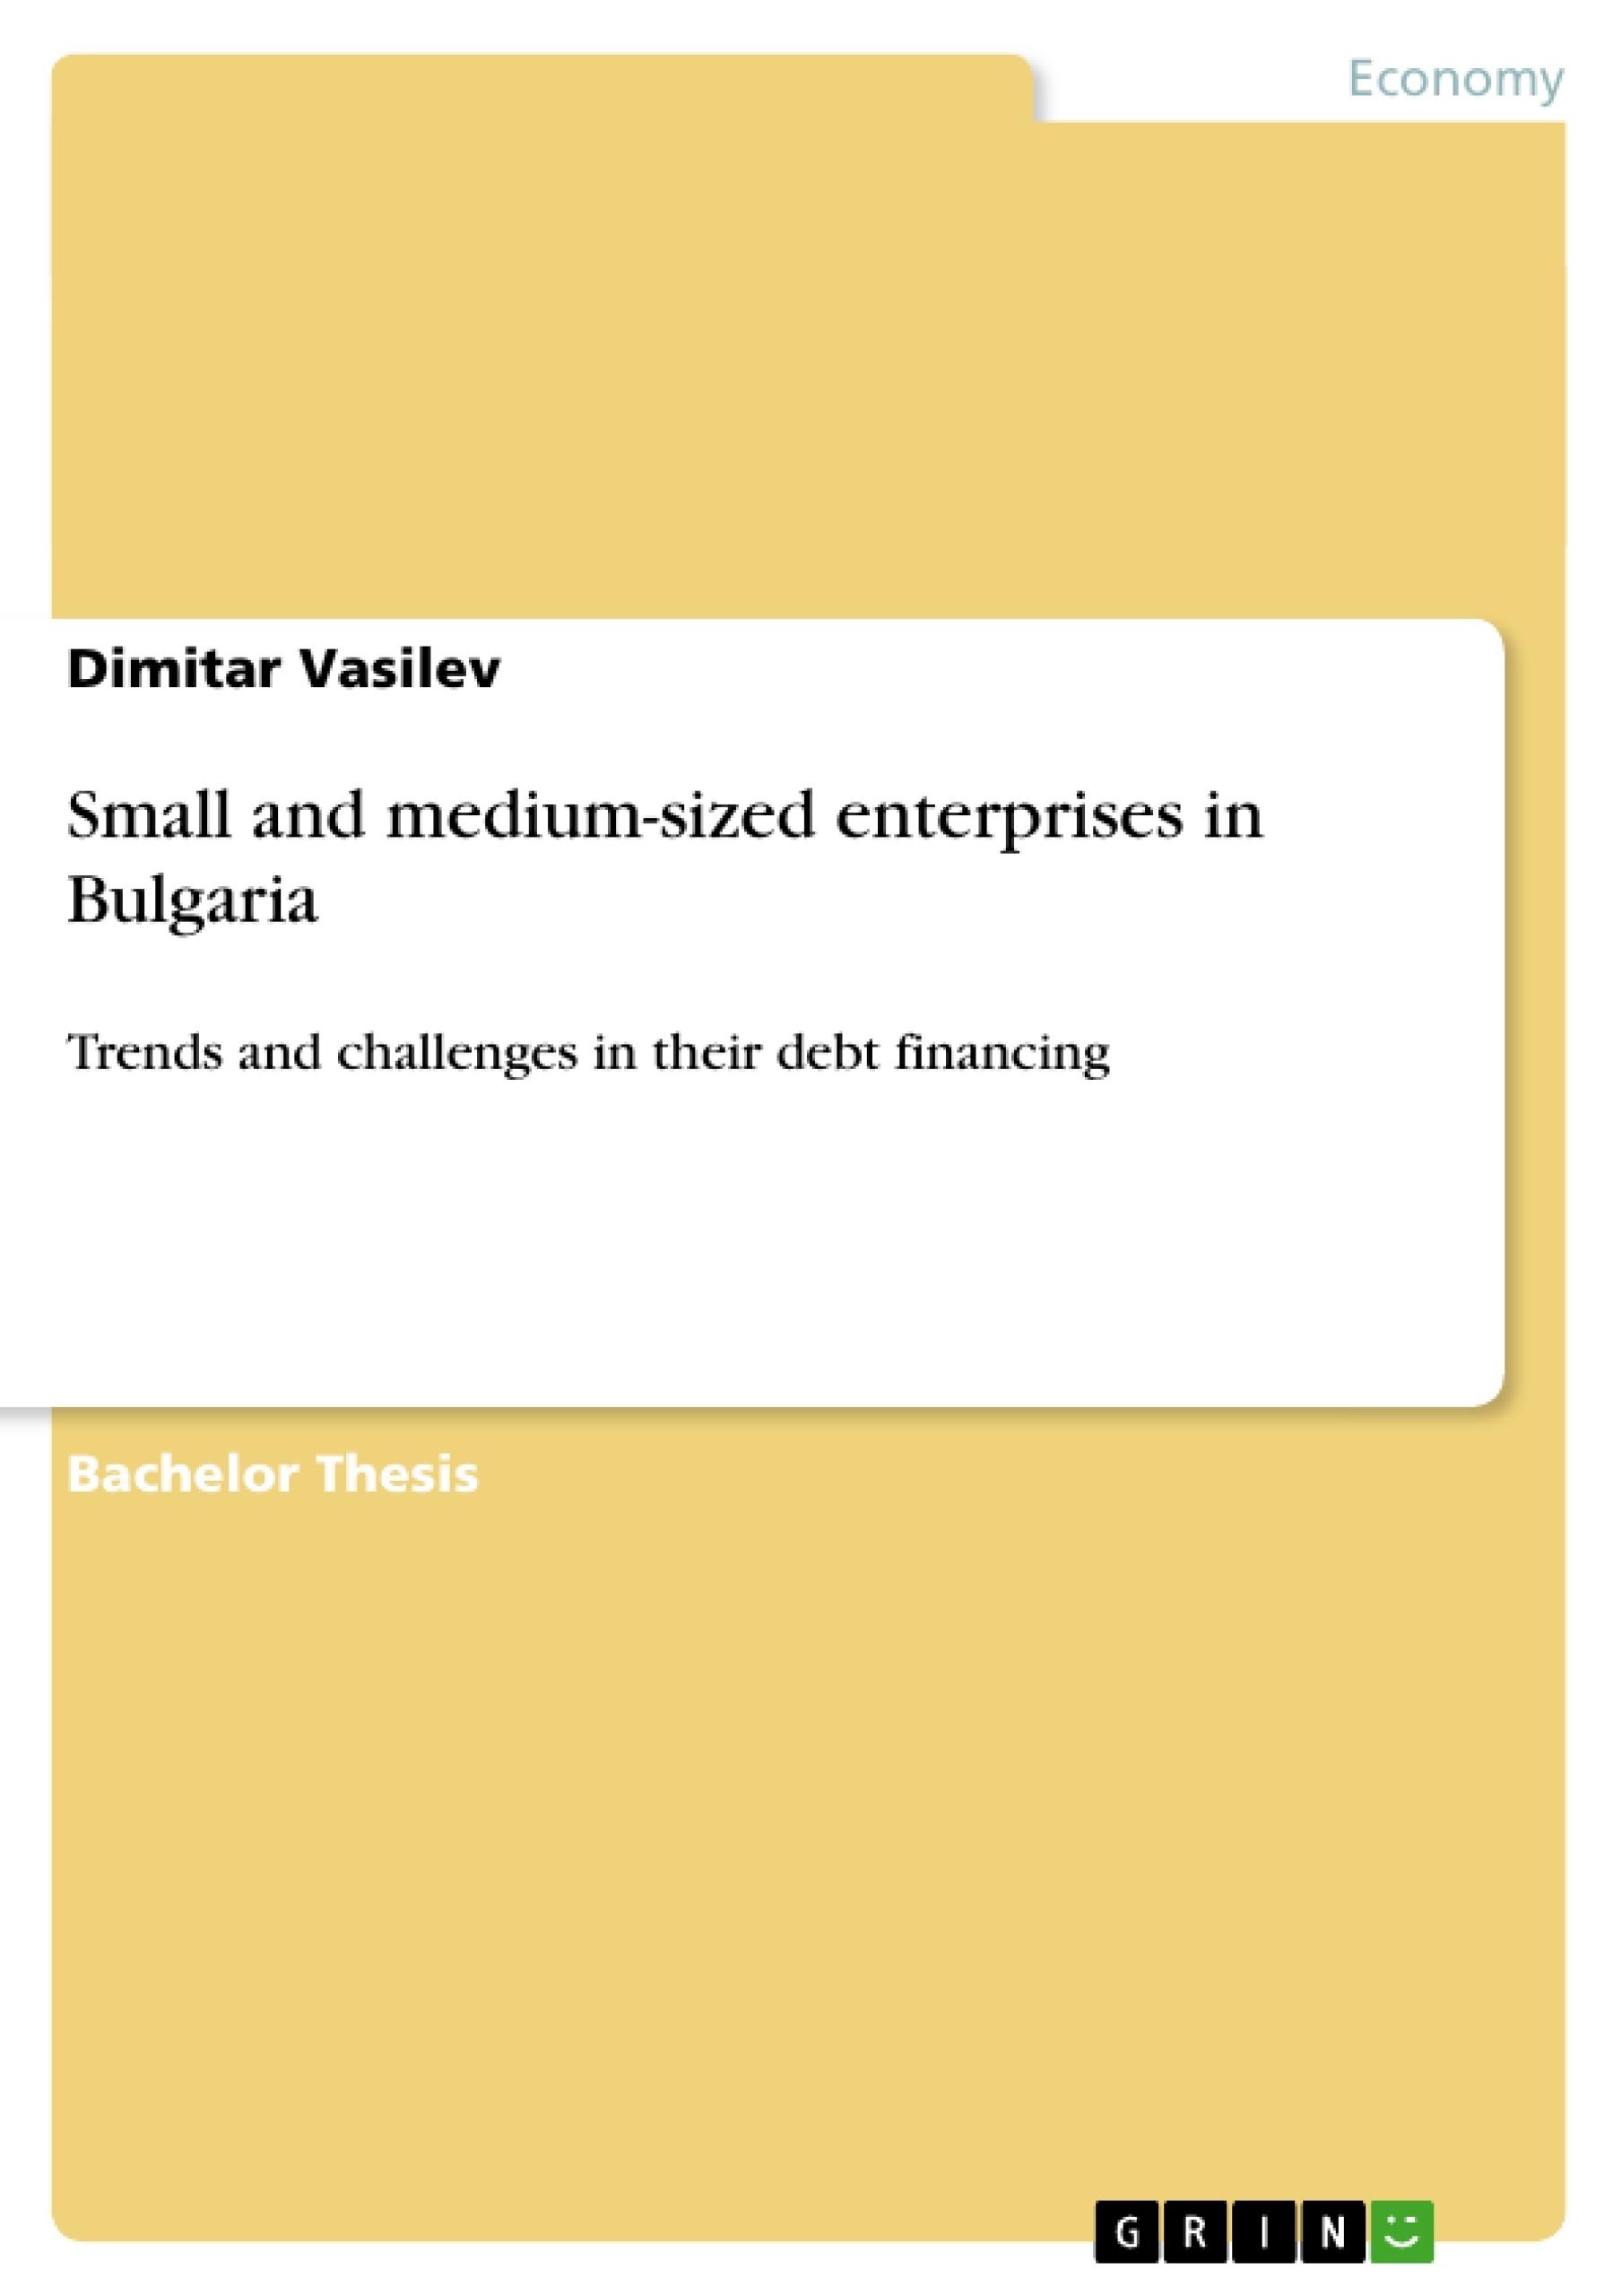 Title: Small and medium-sized enterprises in Bulgaria